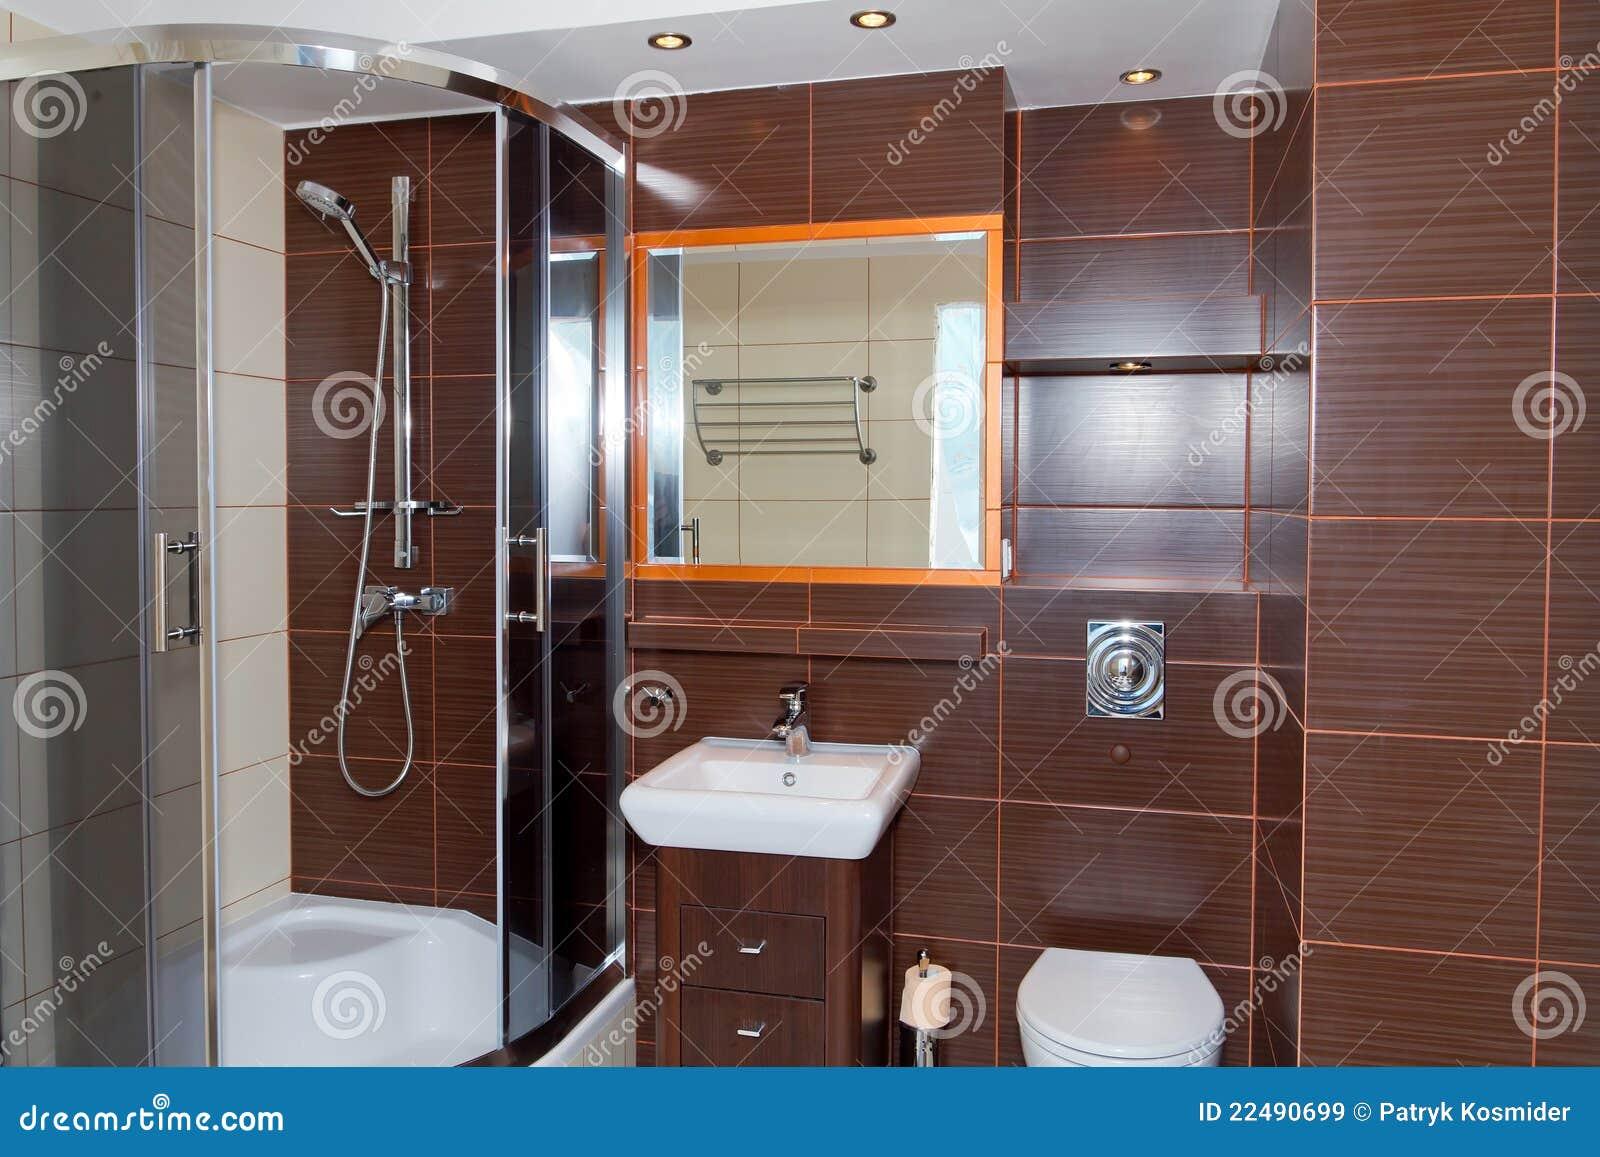 Piastrelle bagno stock cheap piastrelle bagno stock with piastrelle bagno stock outlet mobili - Outlet piastrelle bagno ...